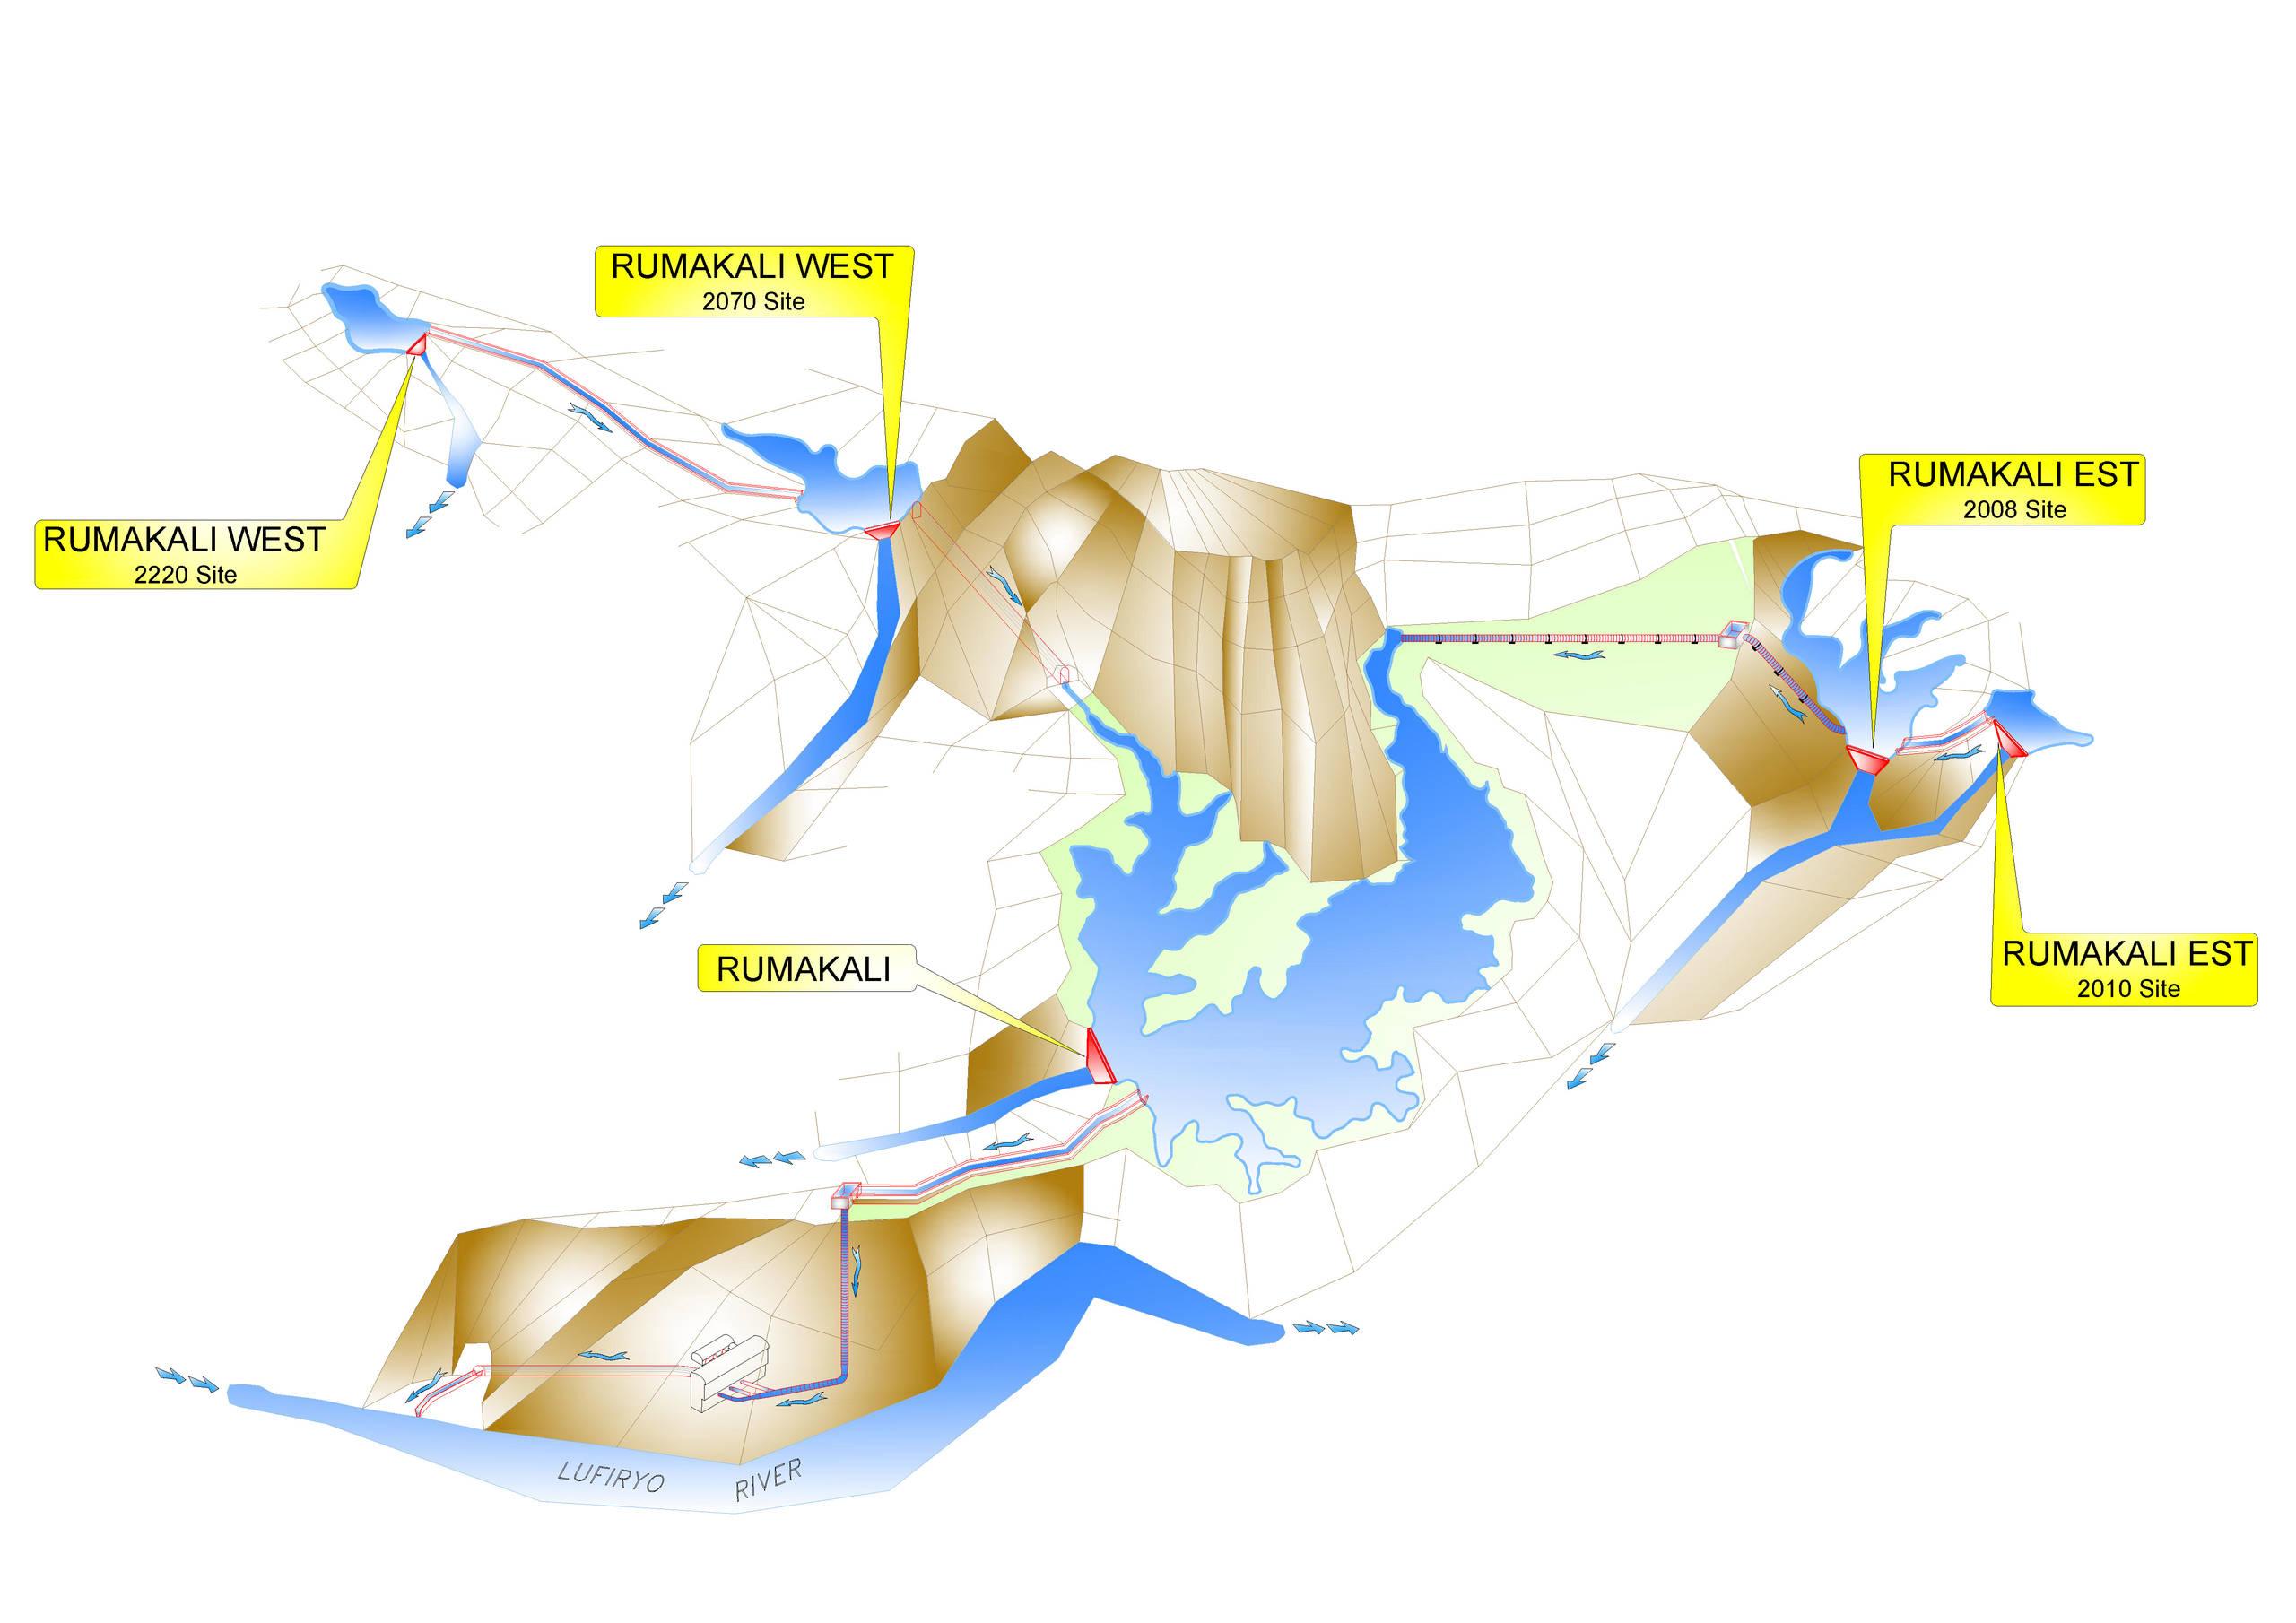 Hydropower - Hydroelectric Power Plant - Hydro Consultancy - Hydropower  Engineering - Rumakali, Iringa,